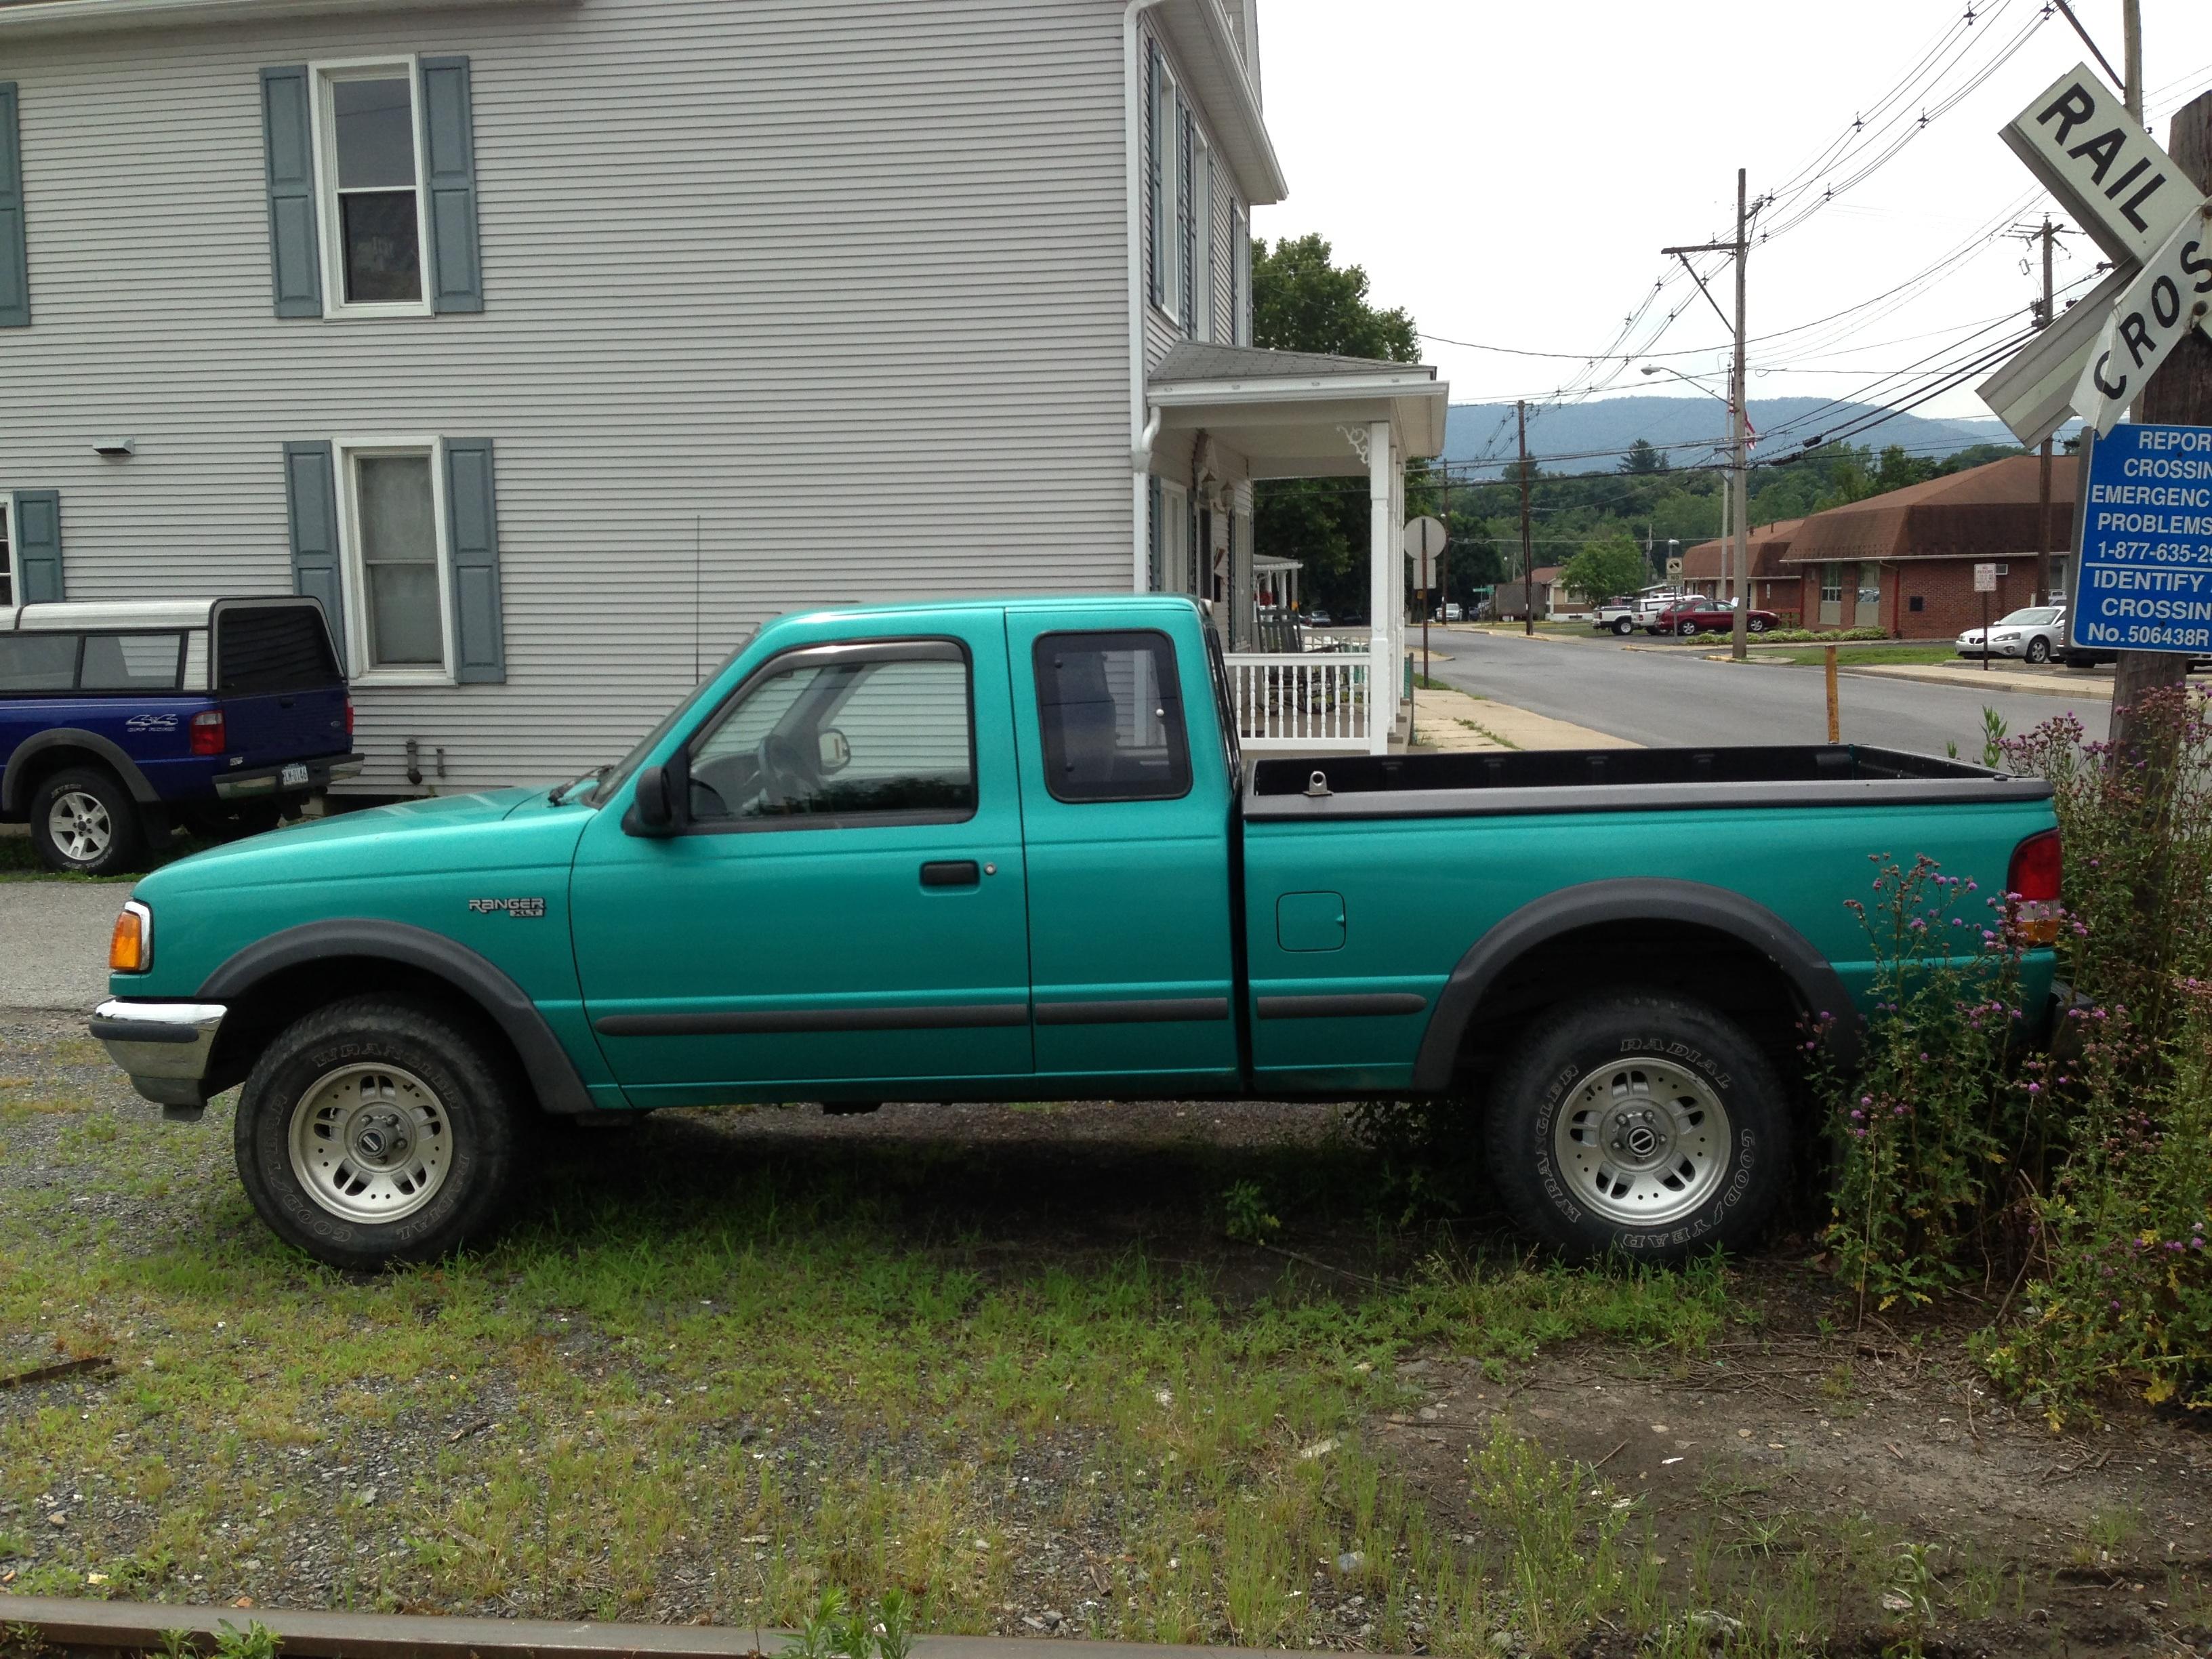 Build Your Own Ford Ranger >> File:1994 Ford Ranger XLT 4x4 extended cab.jpg - Wikimedia Commons